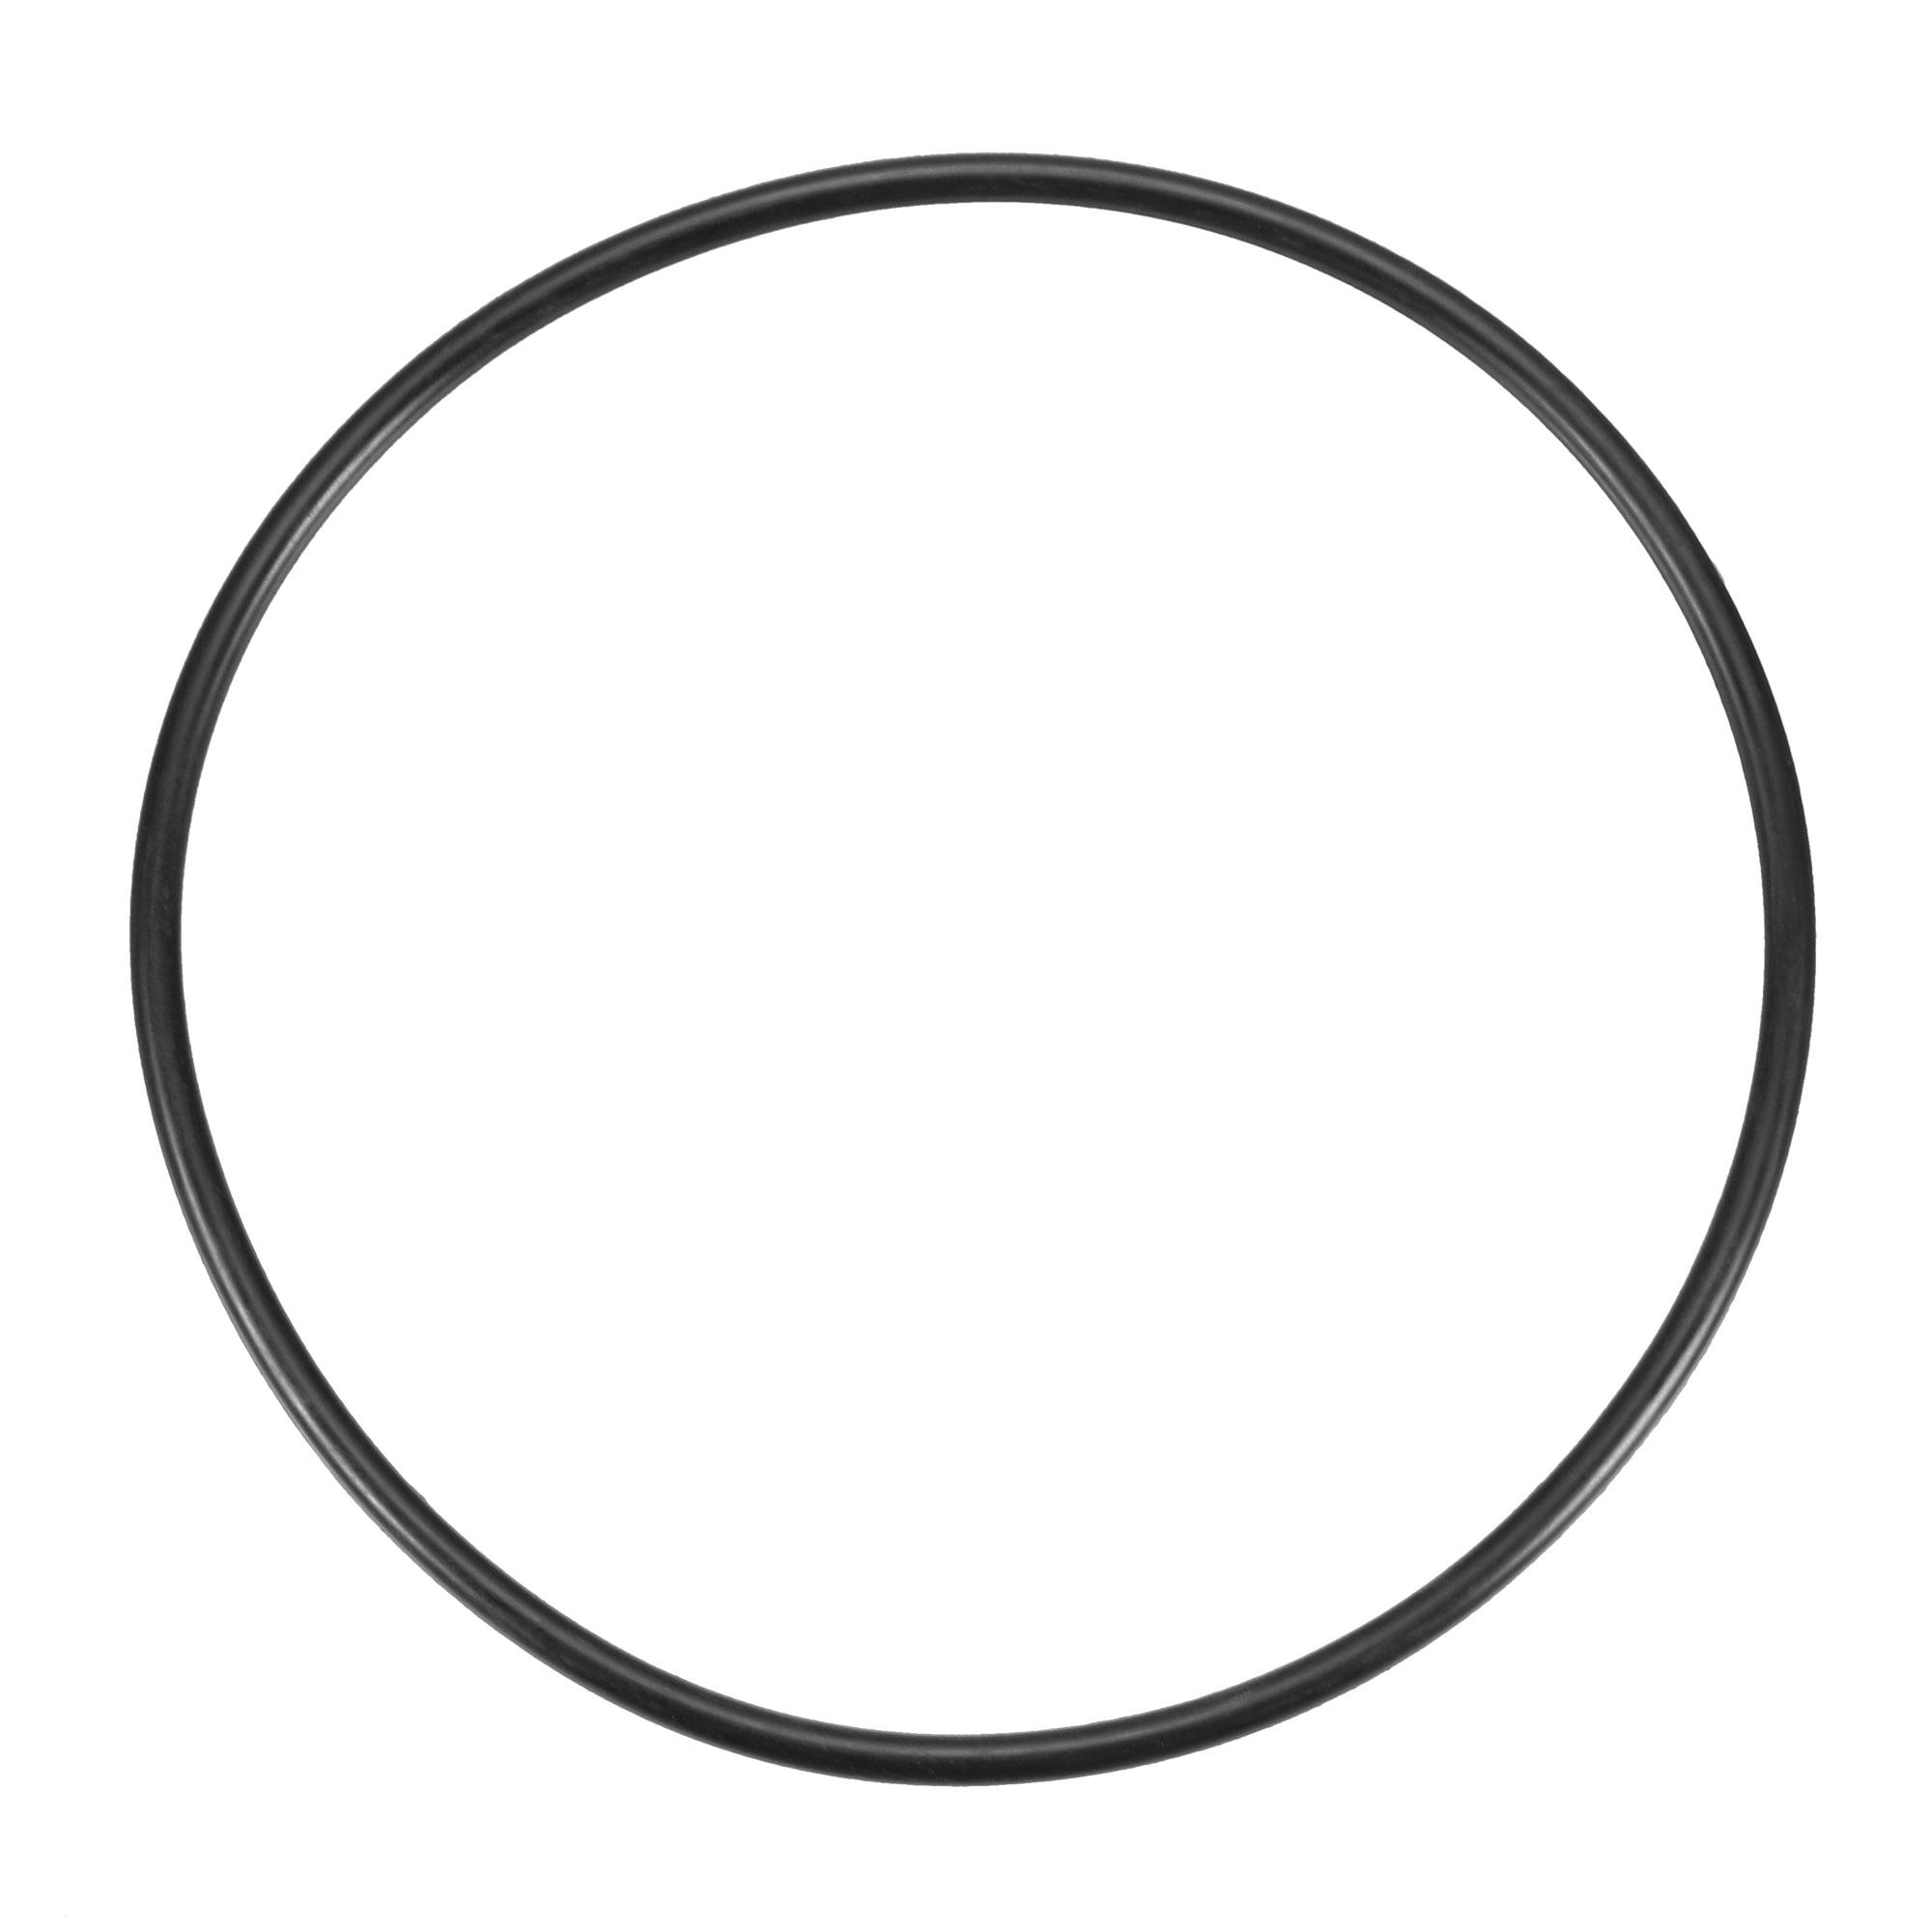 130mm x 4mm Industrial Flexible Rubber Sealing Oil Filter O Rings Gaskets Black